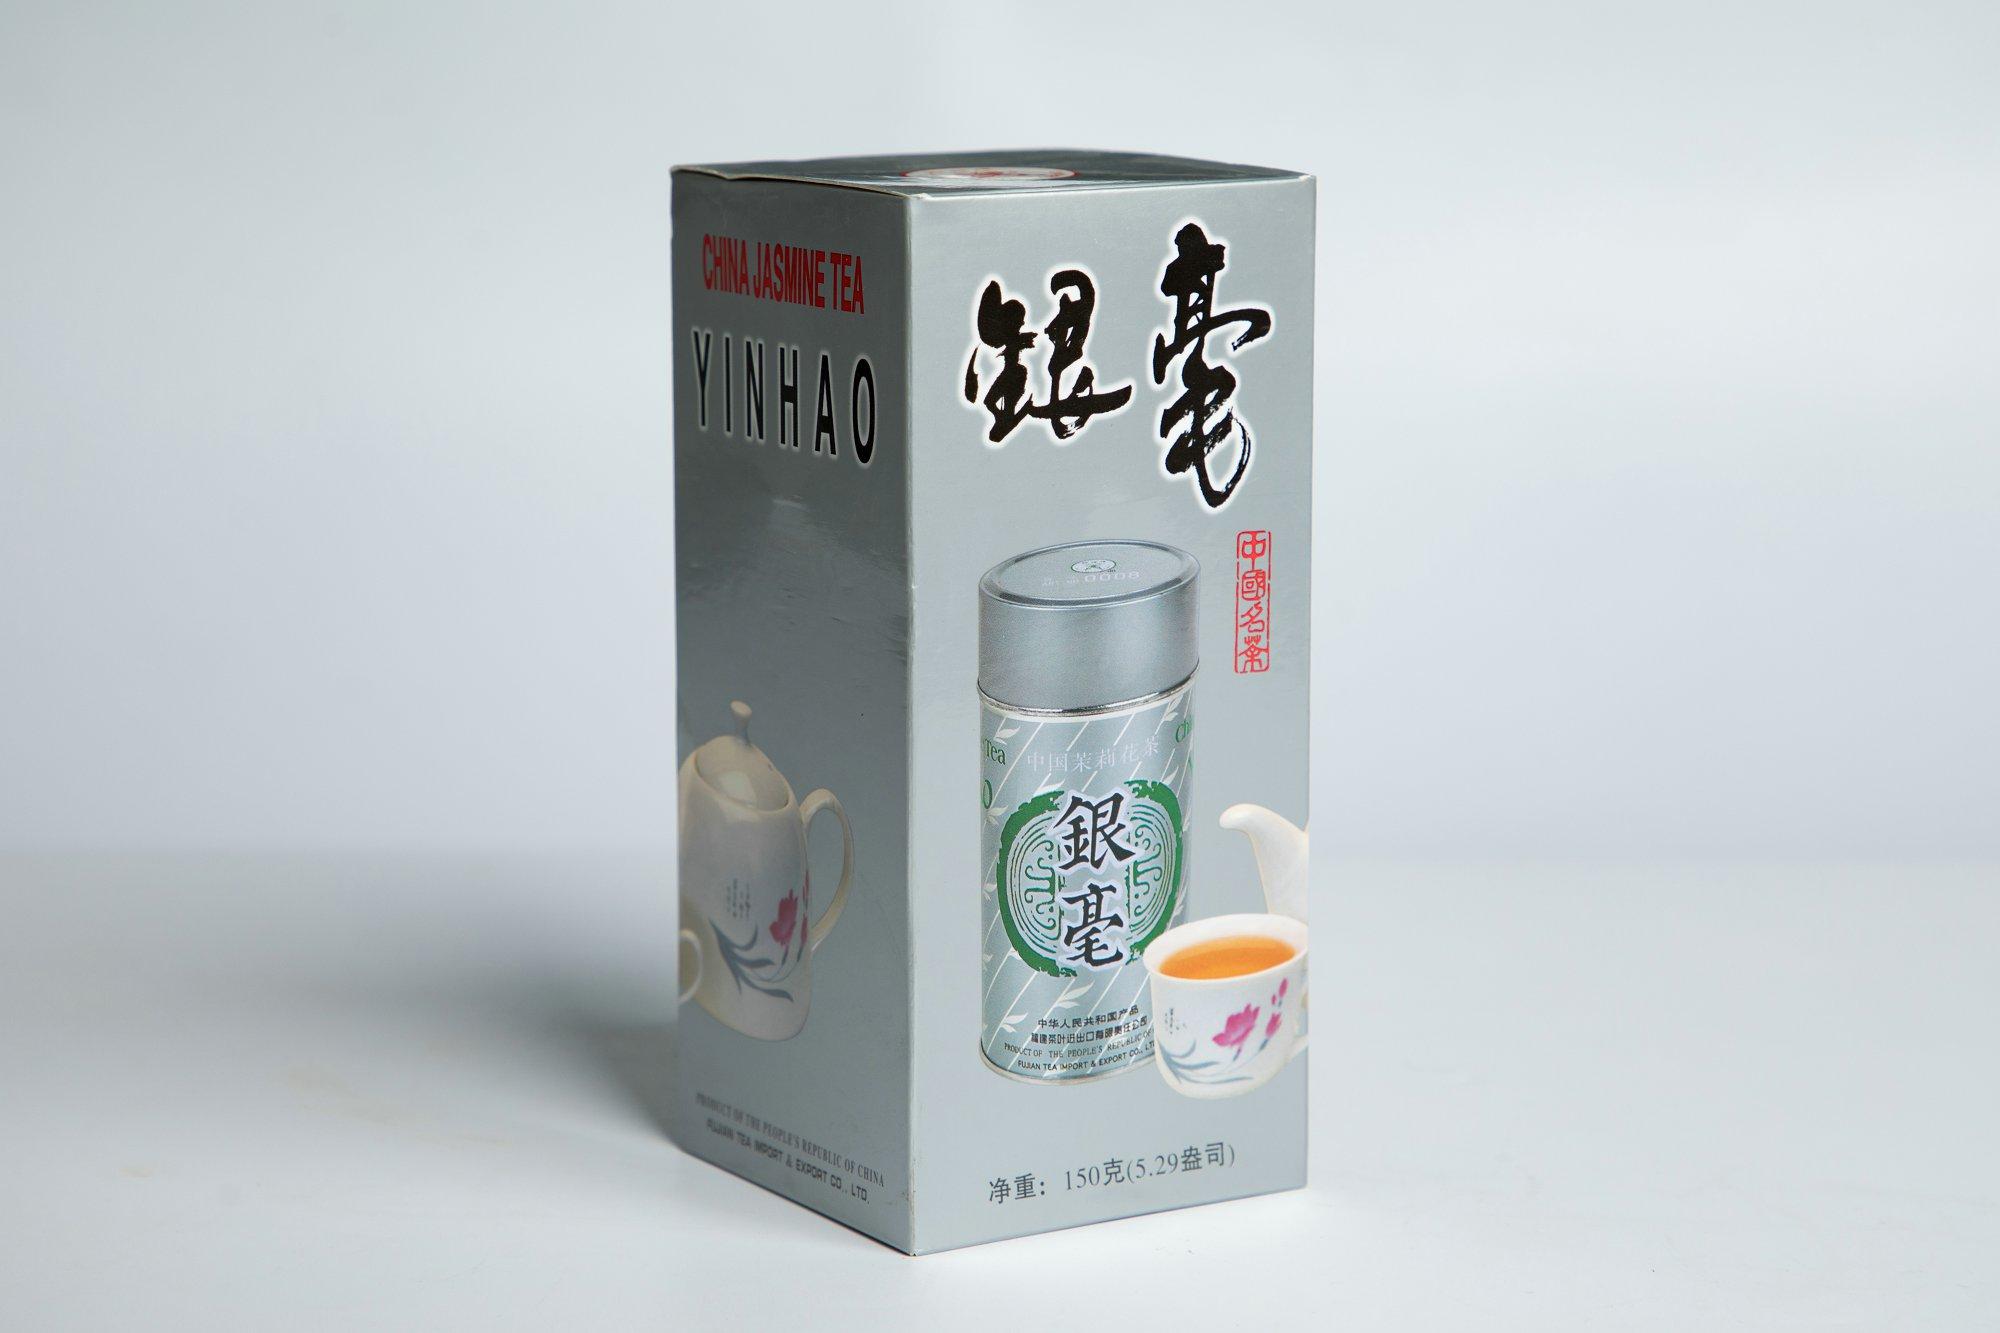 Natural fresh fragrant healthy Bulk Tea Wholesale Fresh Buds Private Label Instant Weight Loss Health Slim Tea - 4uTea | 4uTea.com